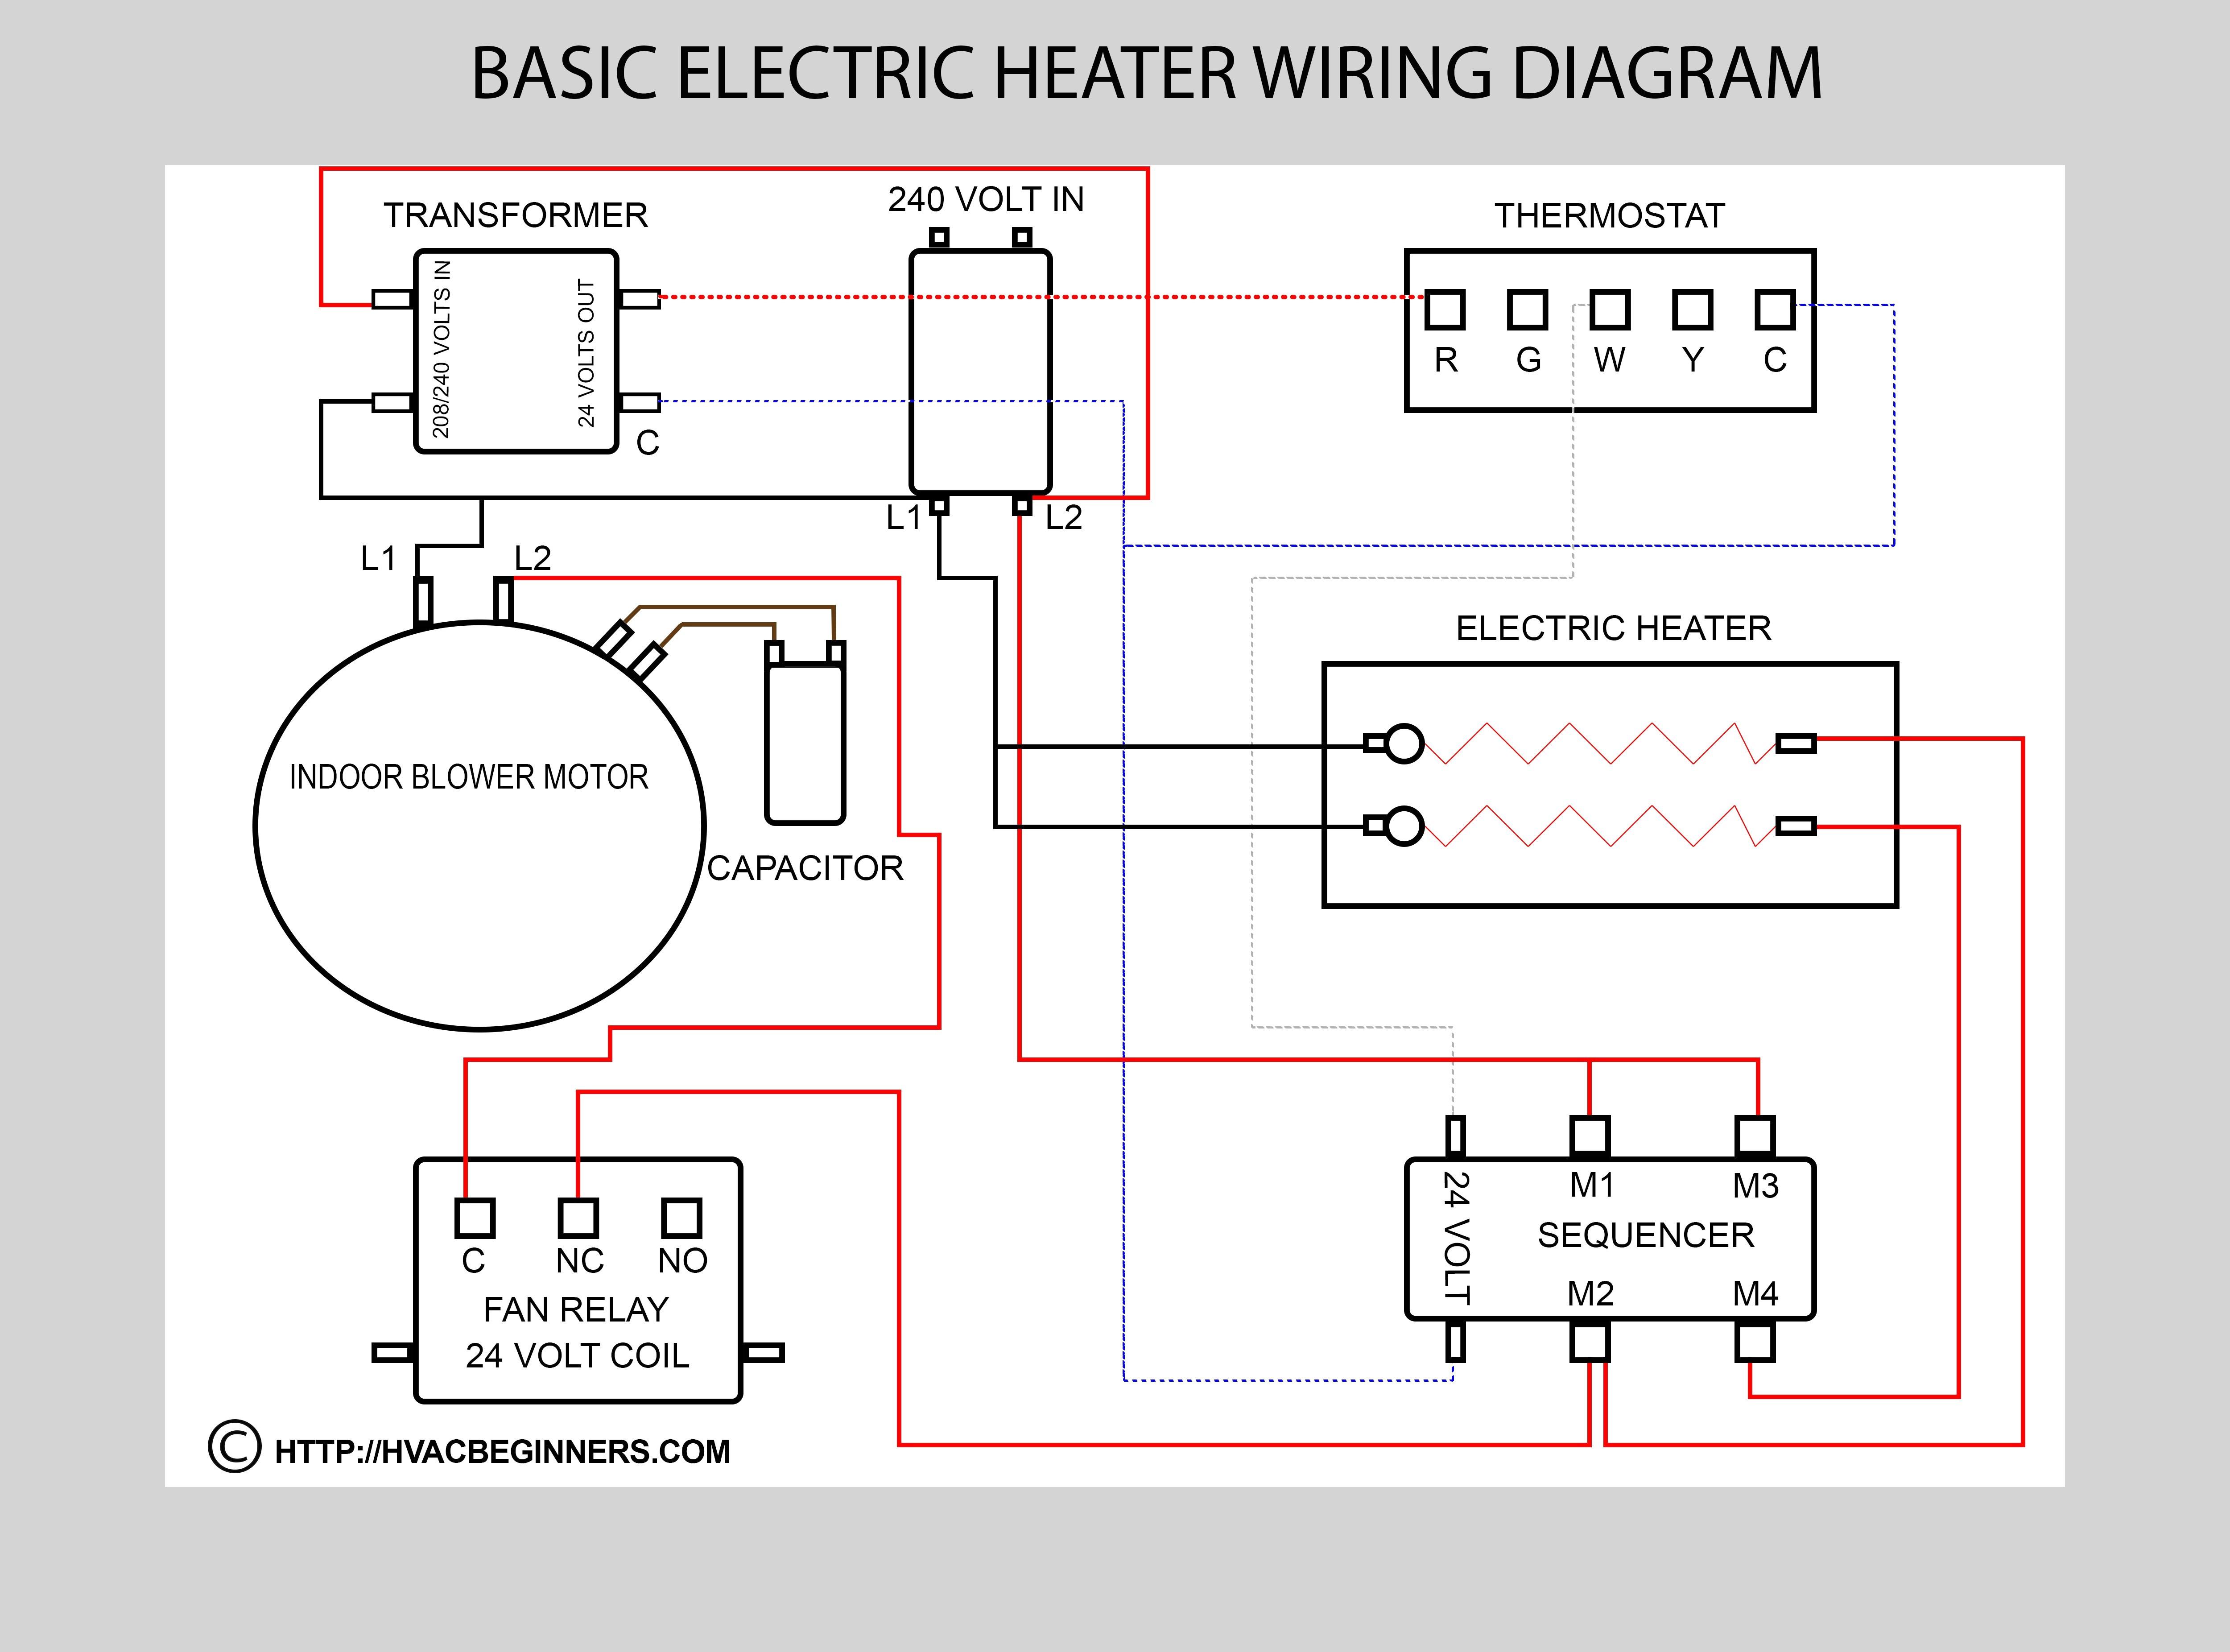 Ruud Heat Pump Wiring Diagram Lennox Blower Motor Wiring Diagram Wiring Diagram Of Ruud Heat Pump Wiring Diagram